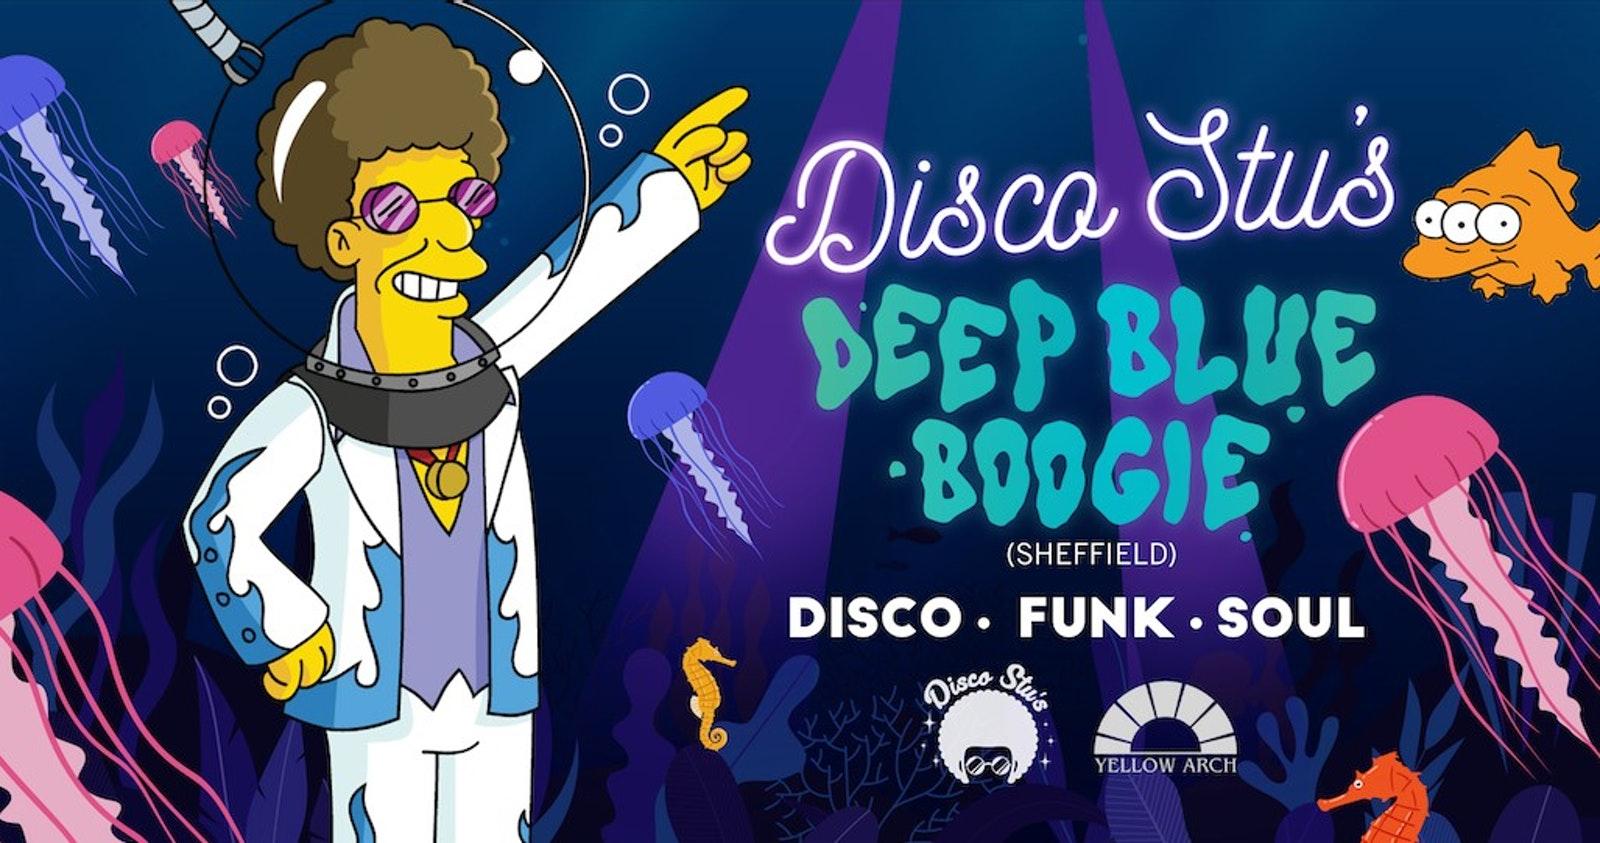 Disco Stu's – Deep Blue Boogie